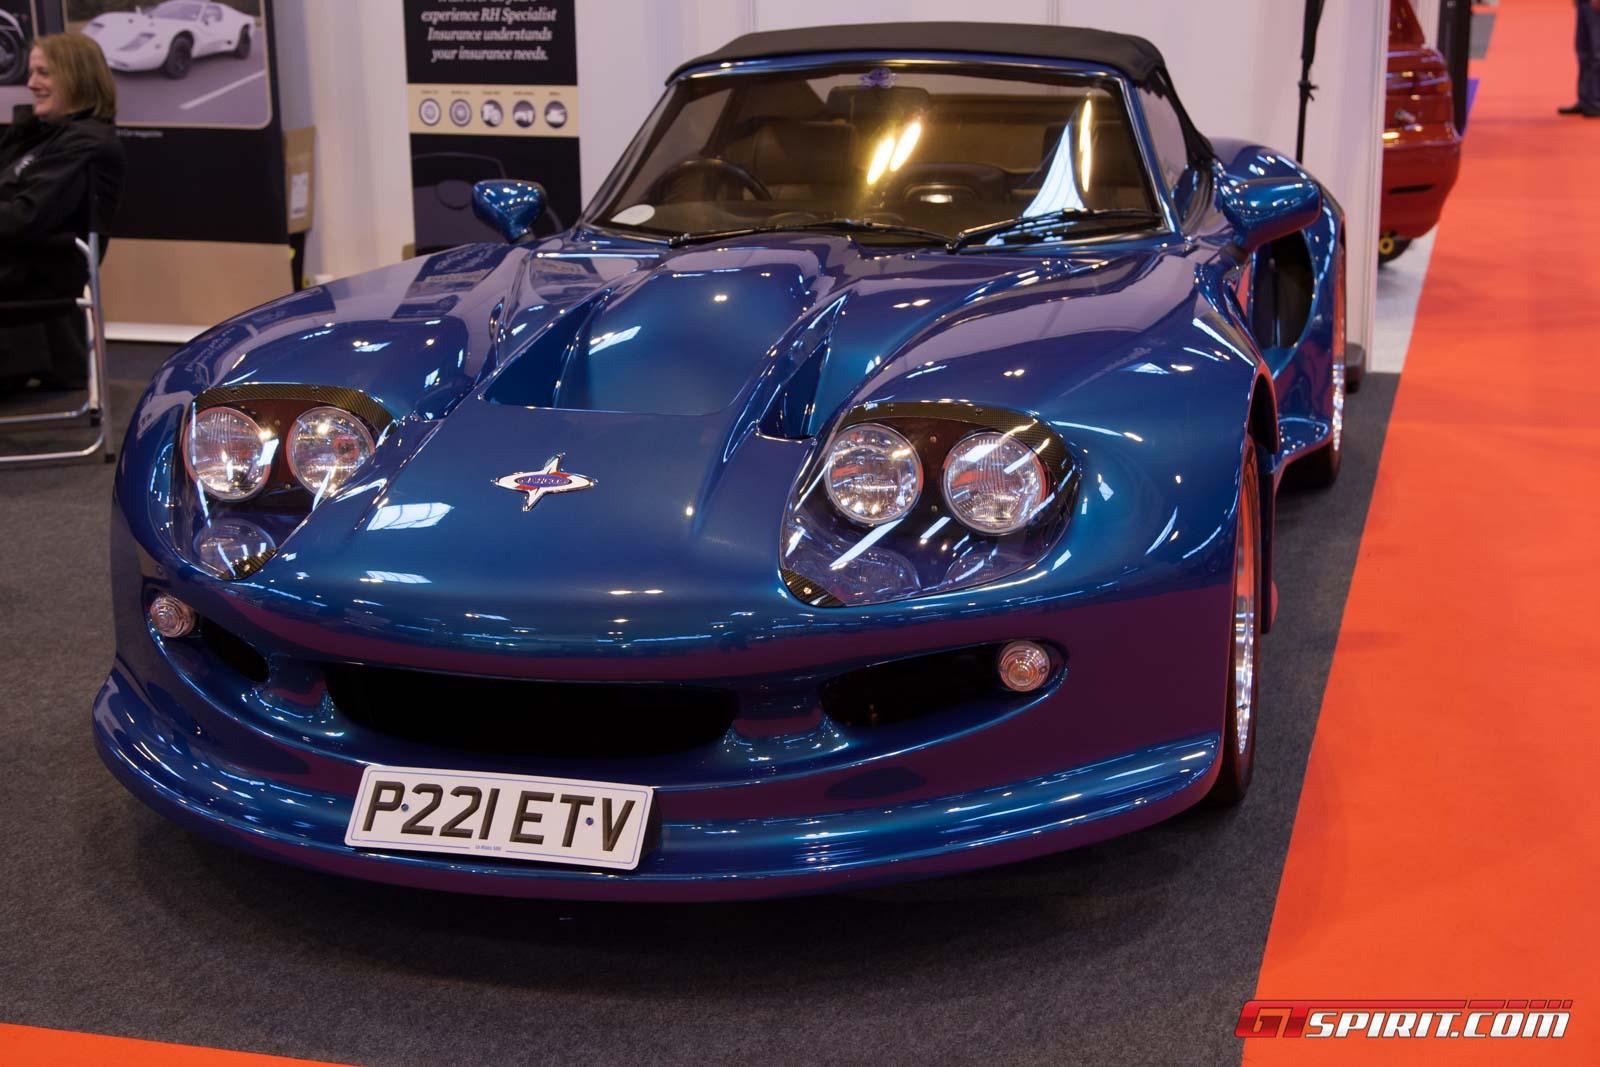 Birmingham Classic Car Show GTspirit - Car show event insurance